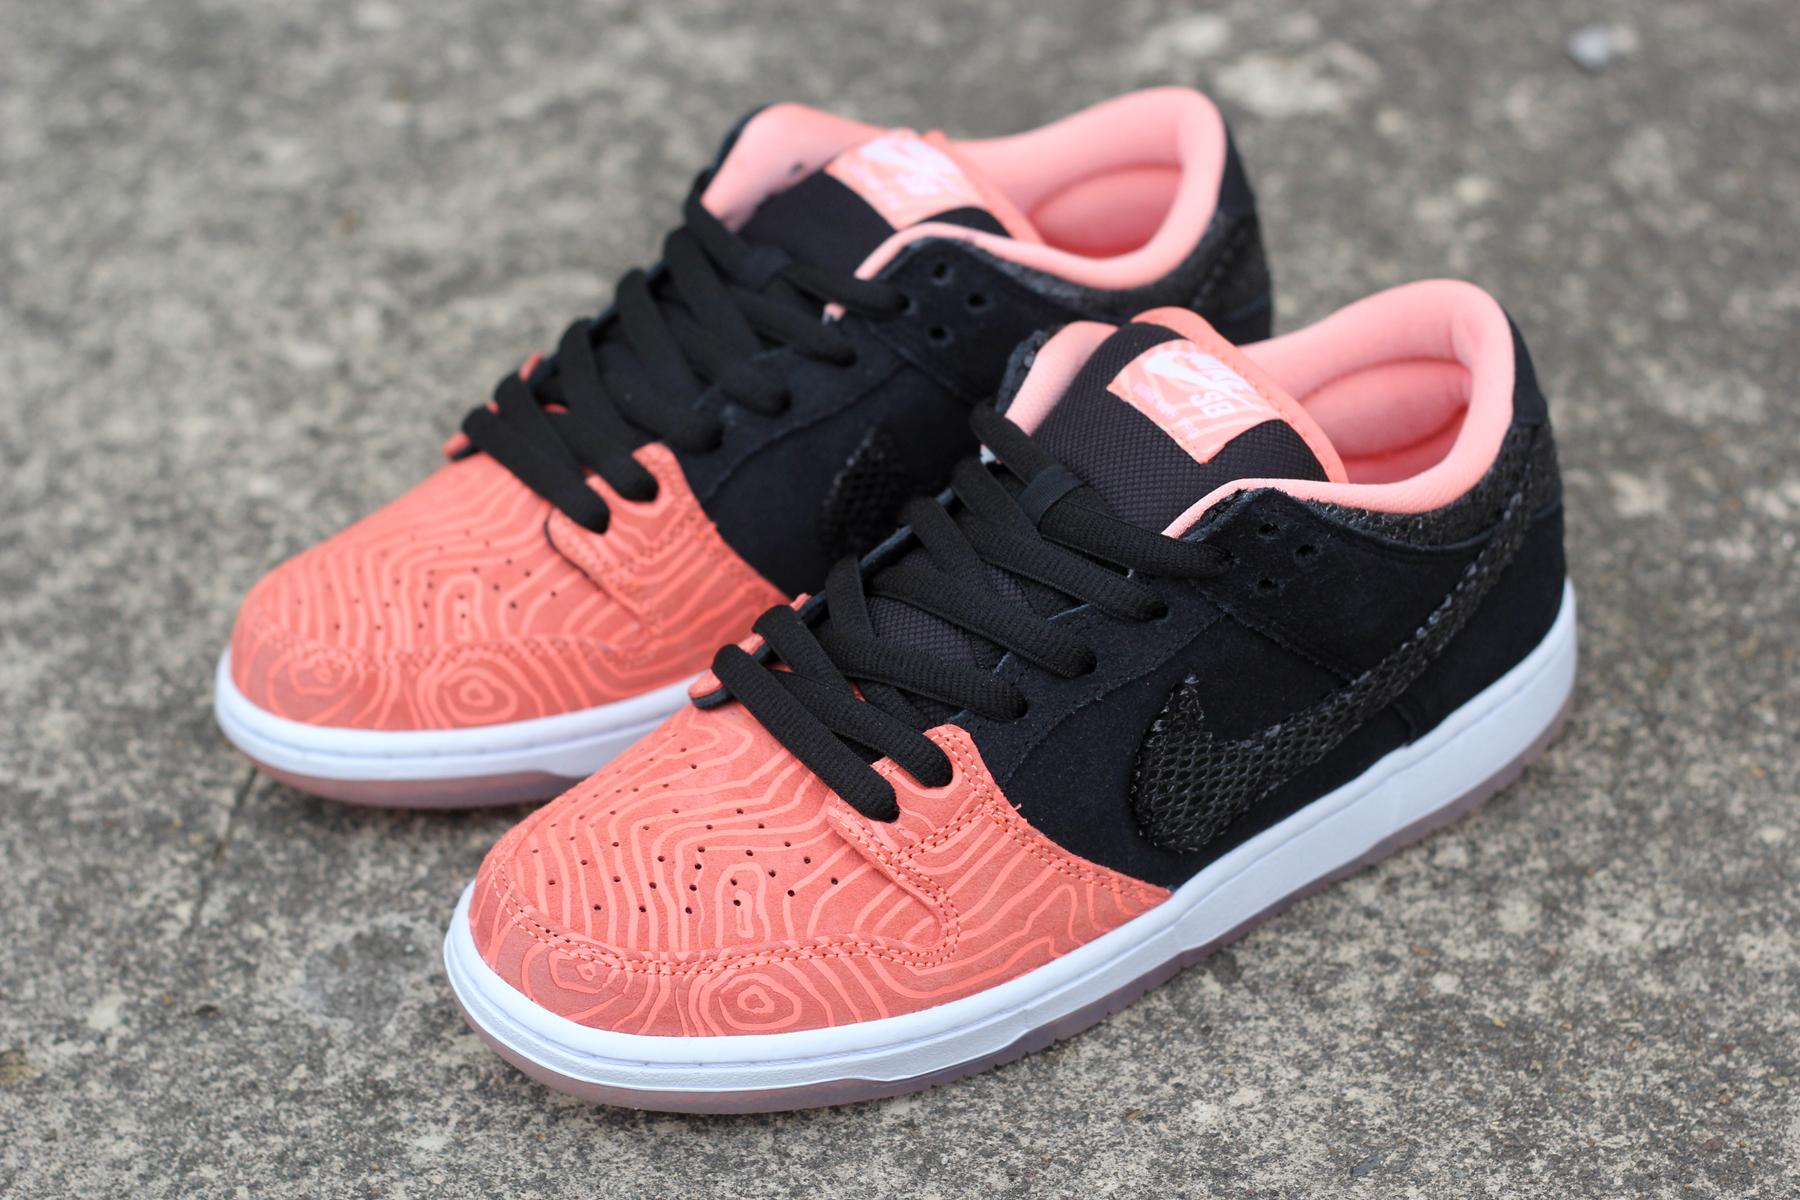 SneakerShouts x Tactics Nike SB Dunk